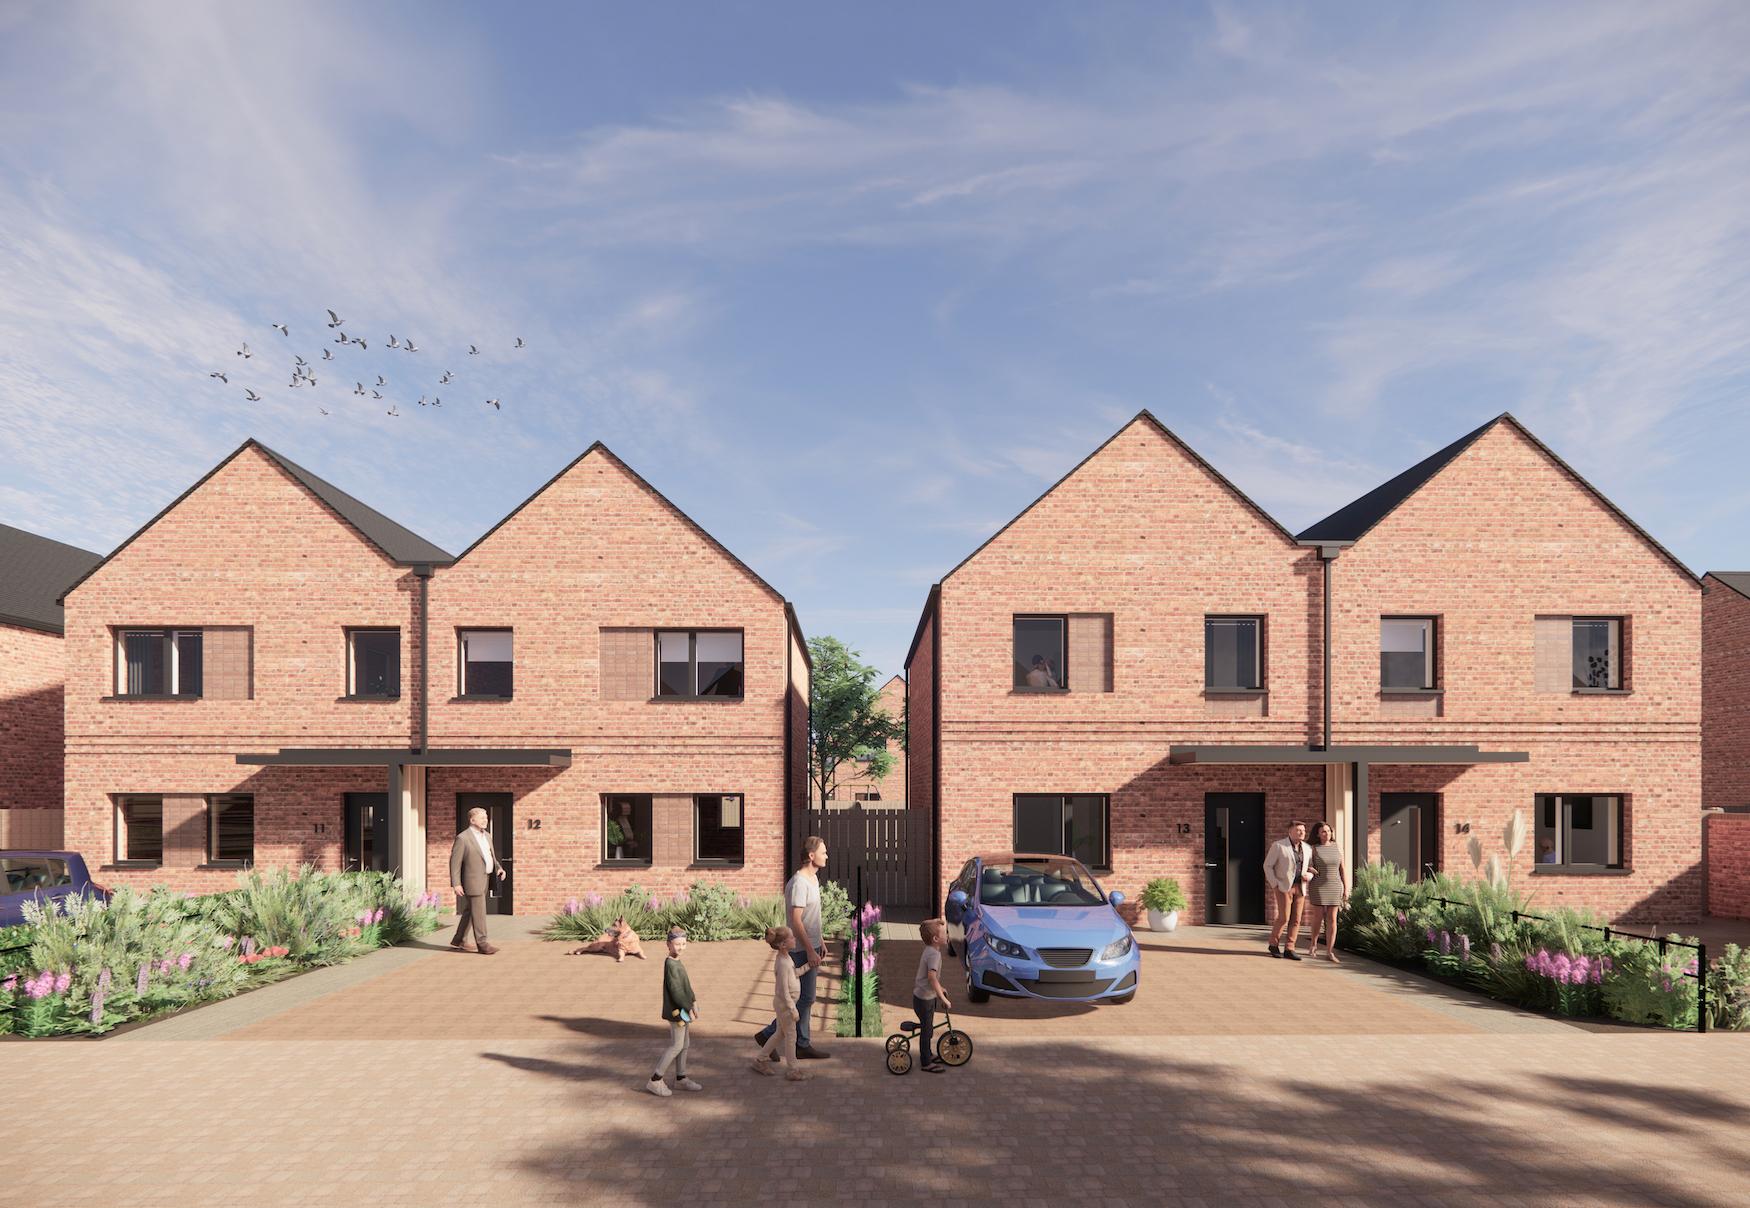 Cornovii Homes announce first development, The Frith